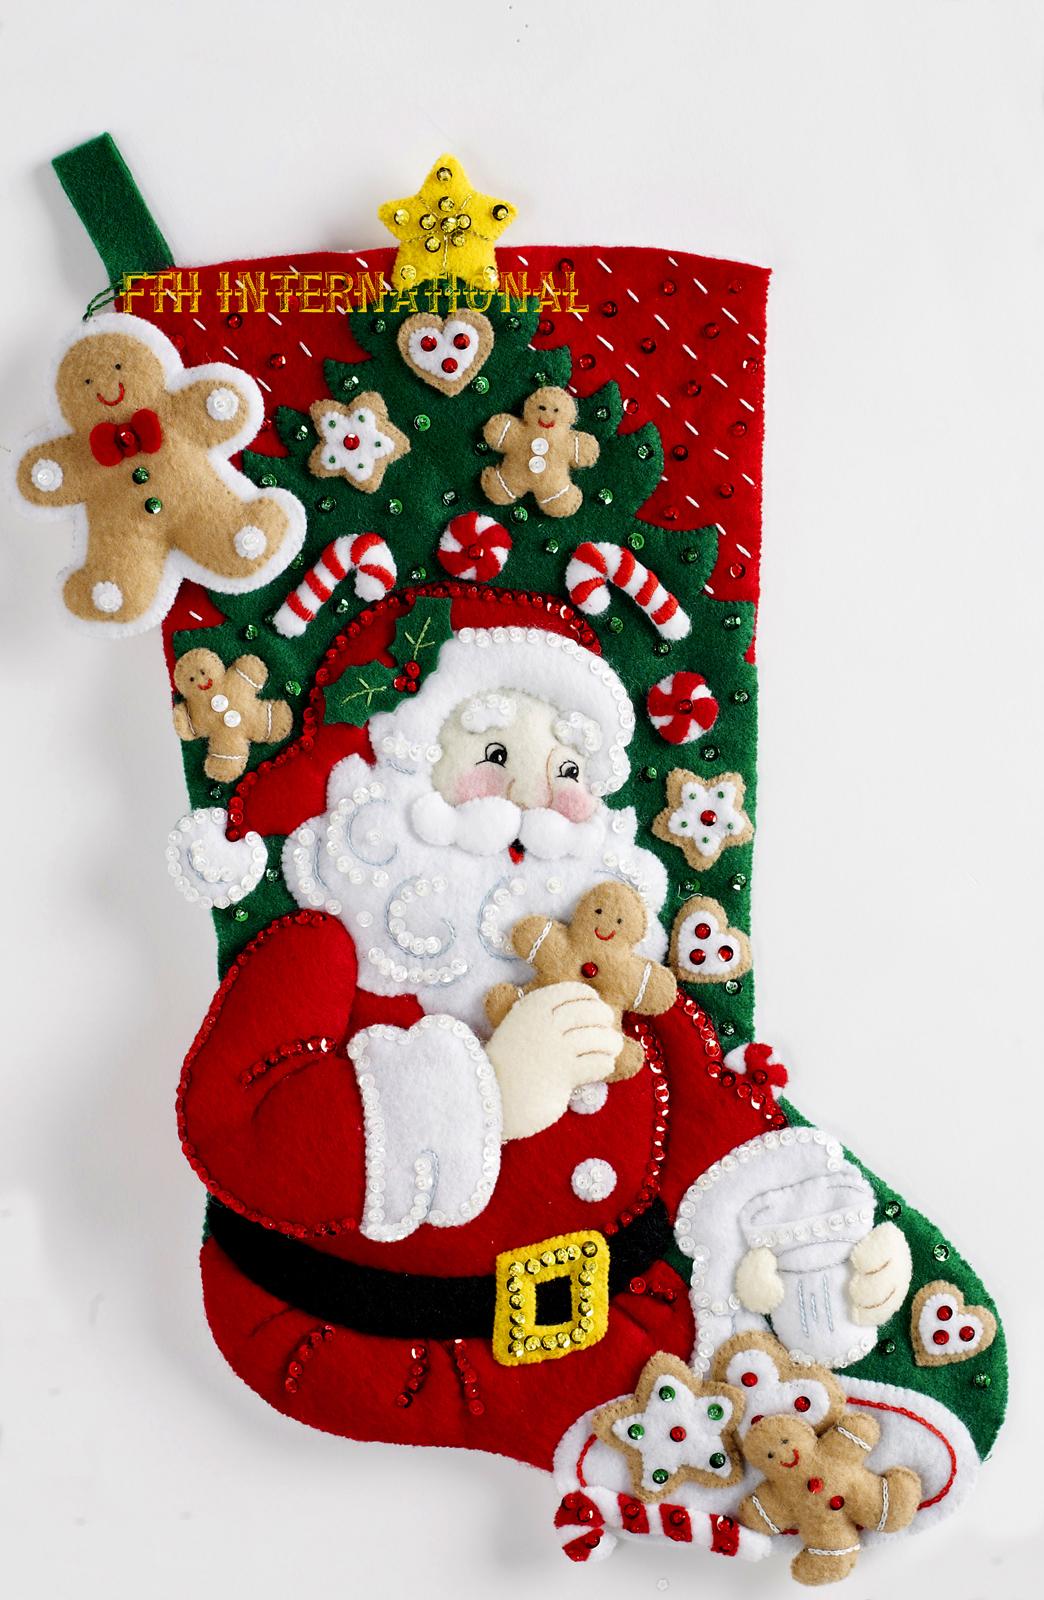 Snack Time 18 Bucilla Felt Christmas Stocking Kit 86655 Santa Cookies